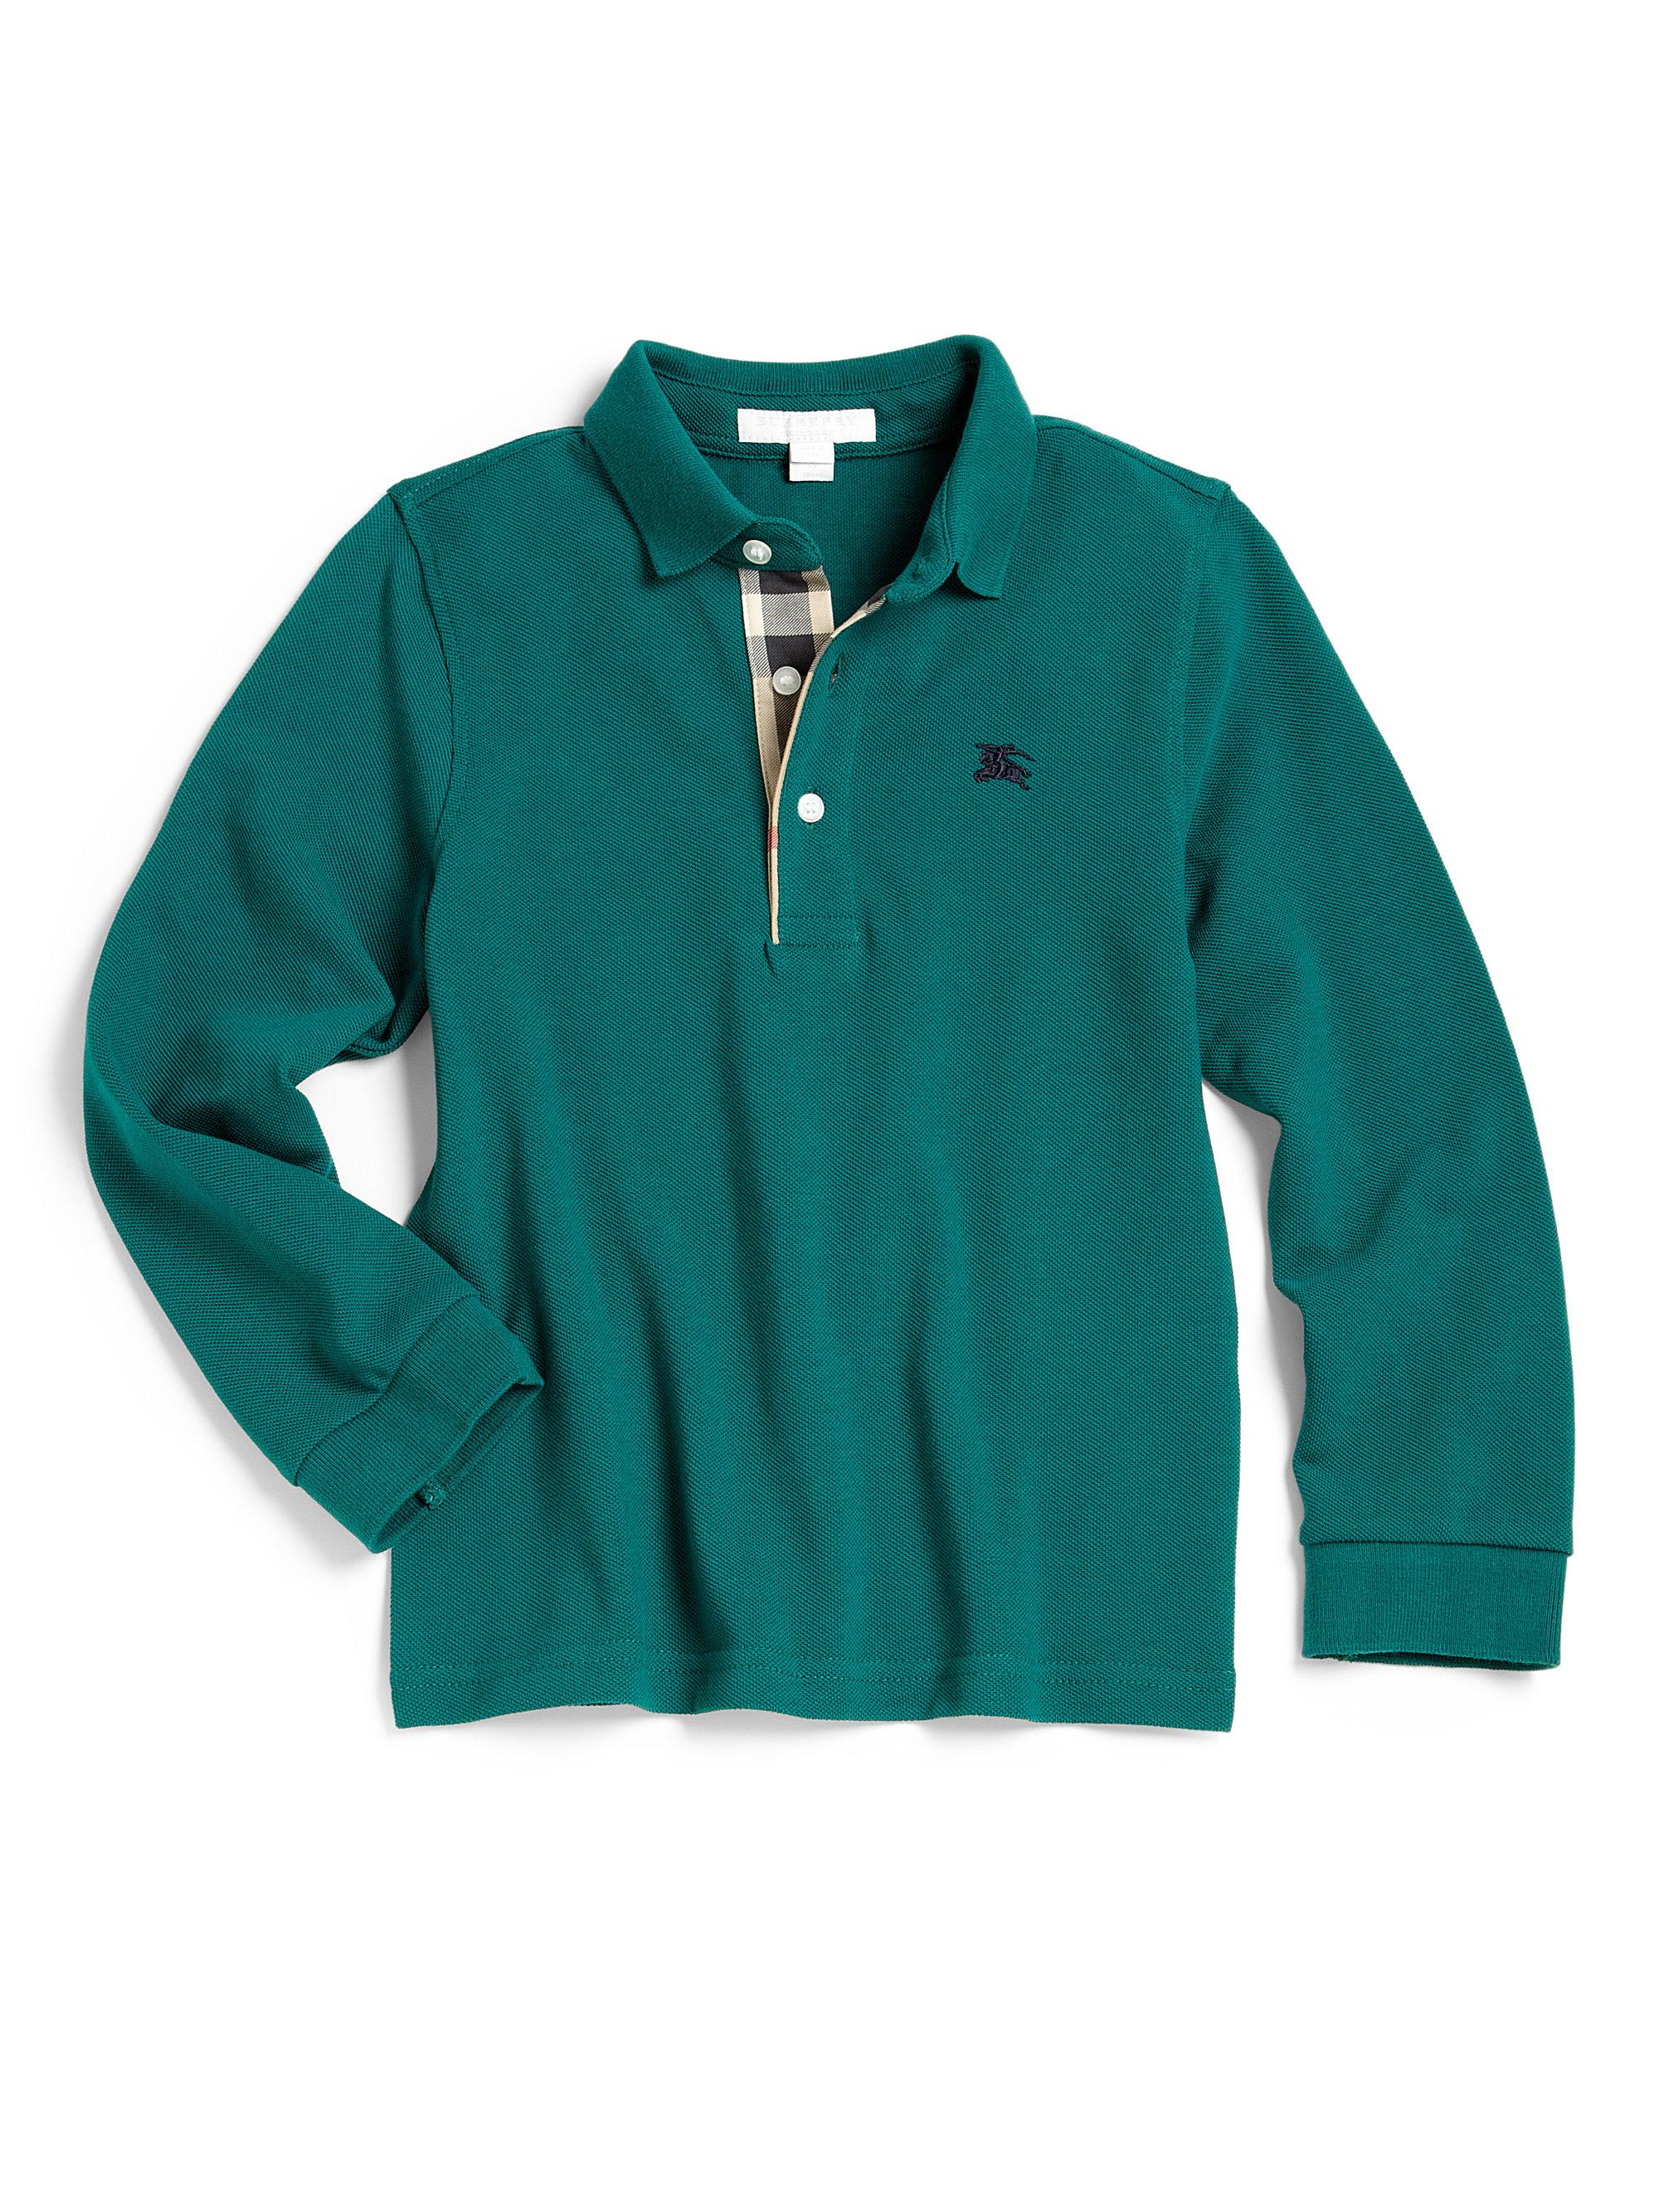 Burberry little boys long sleeve pique polo shirt in green for Long sleeved polo shirts for boys